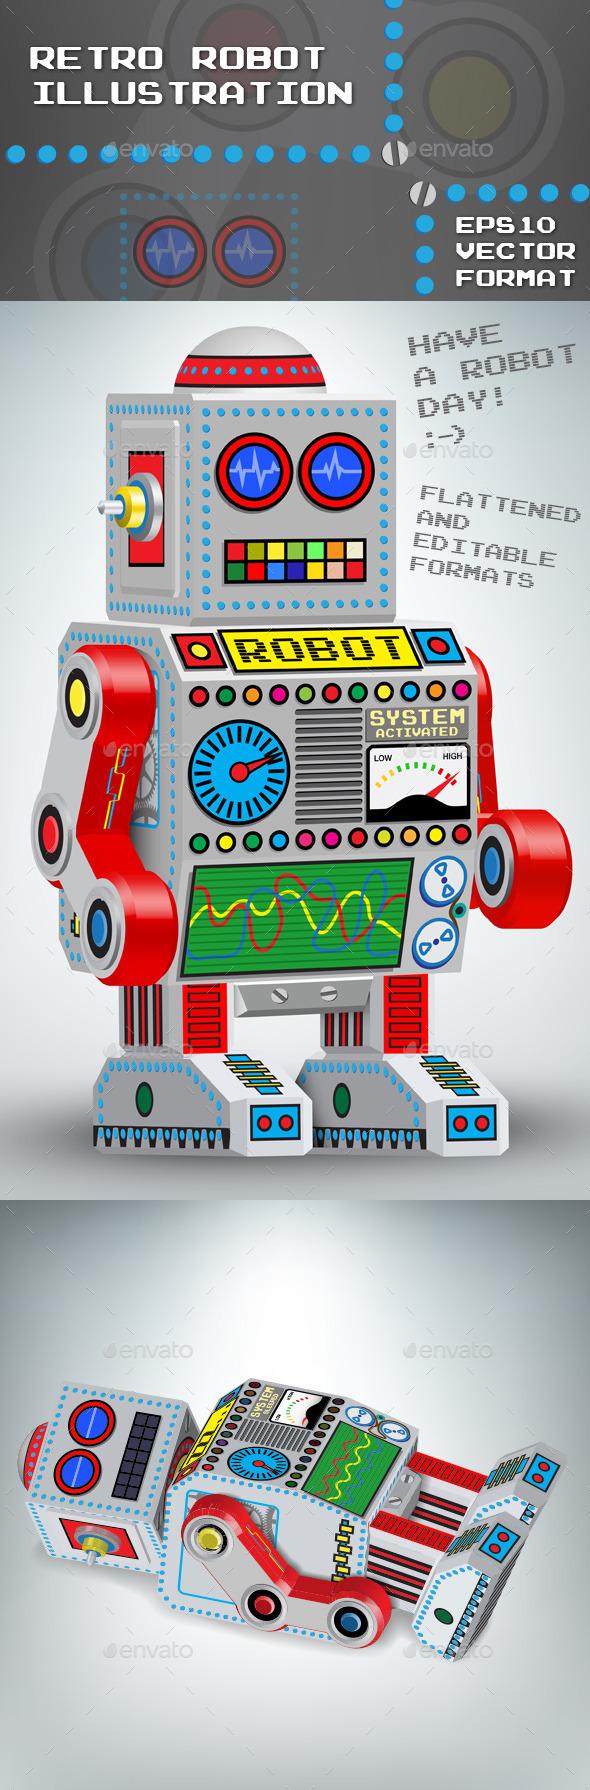 Retro robot toy 3d illustration - Retro Technology